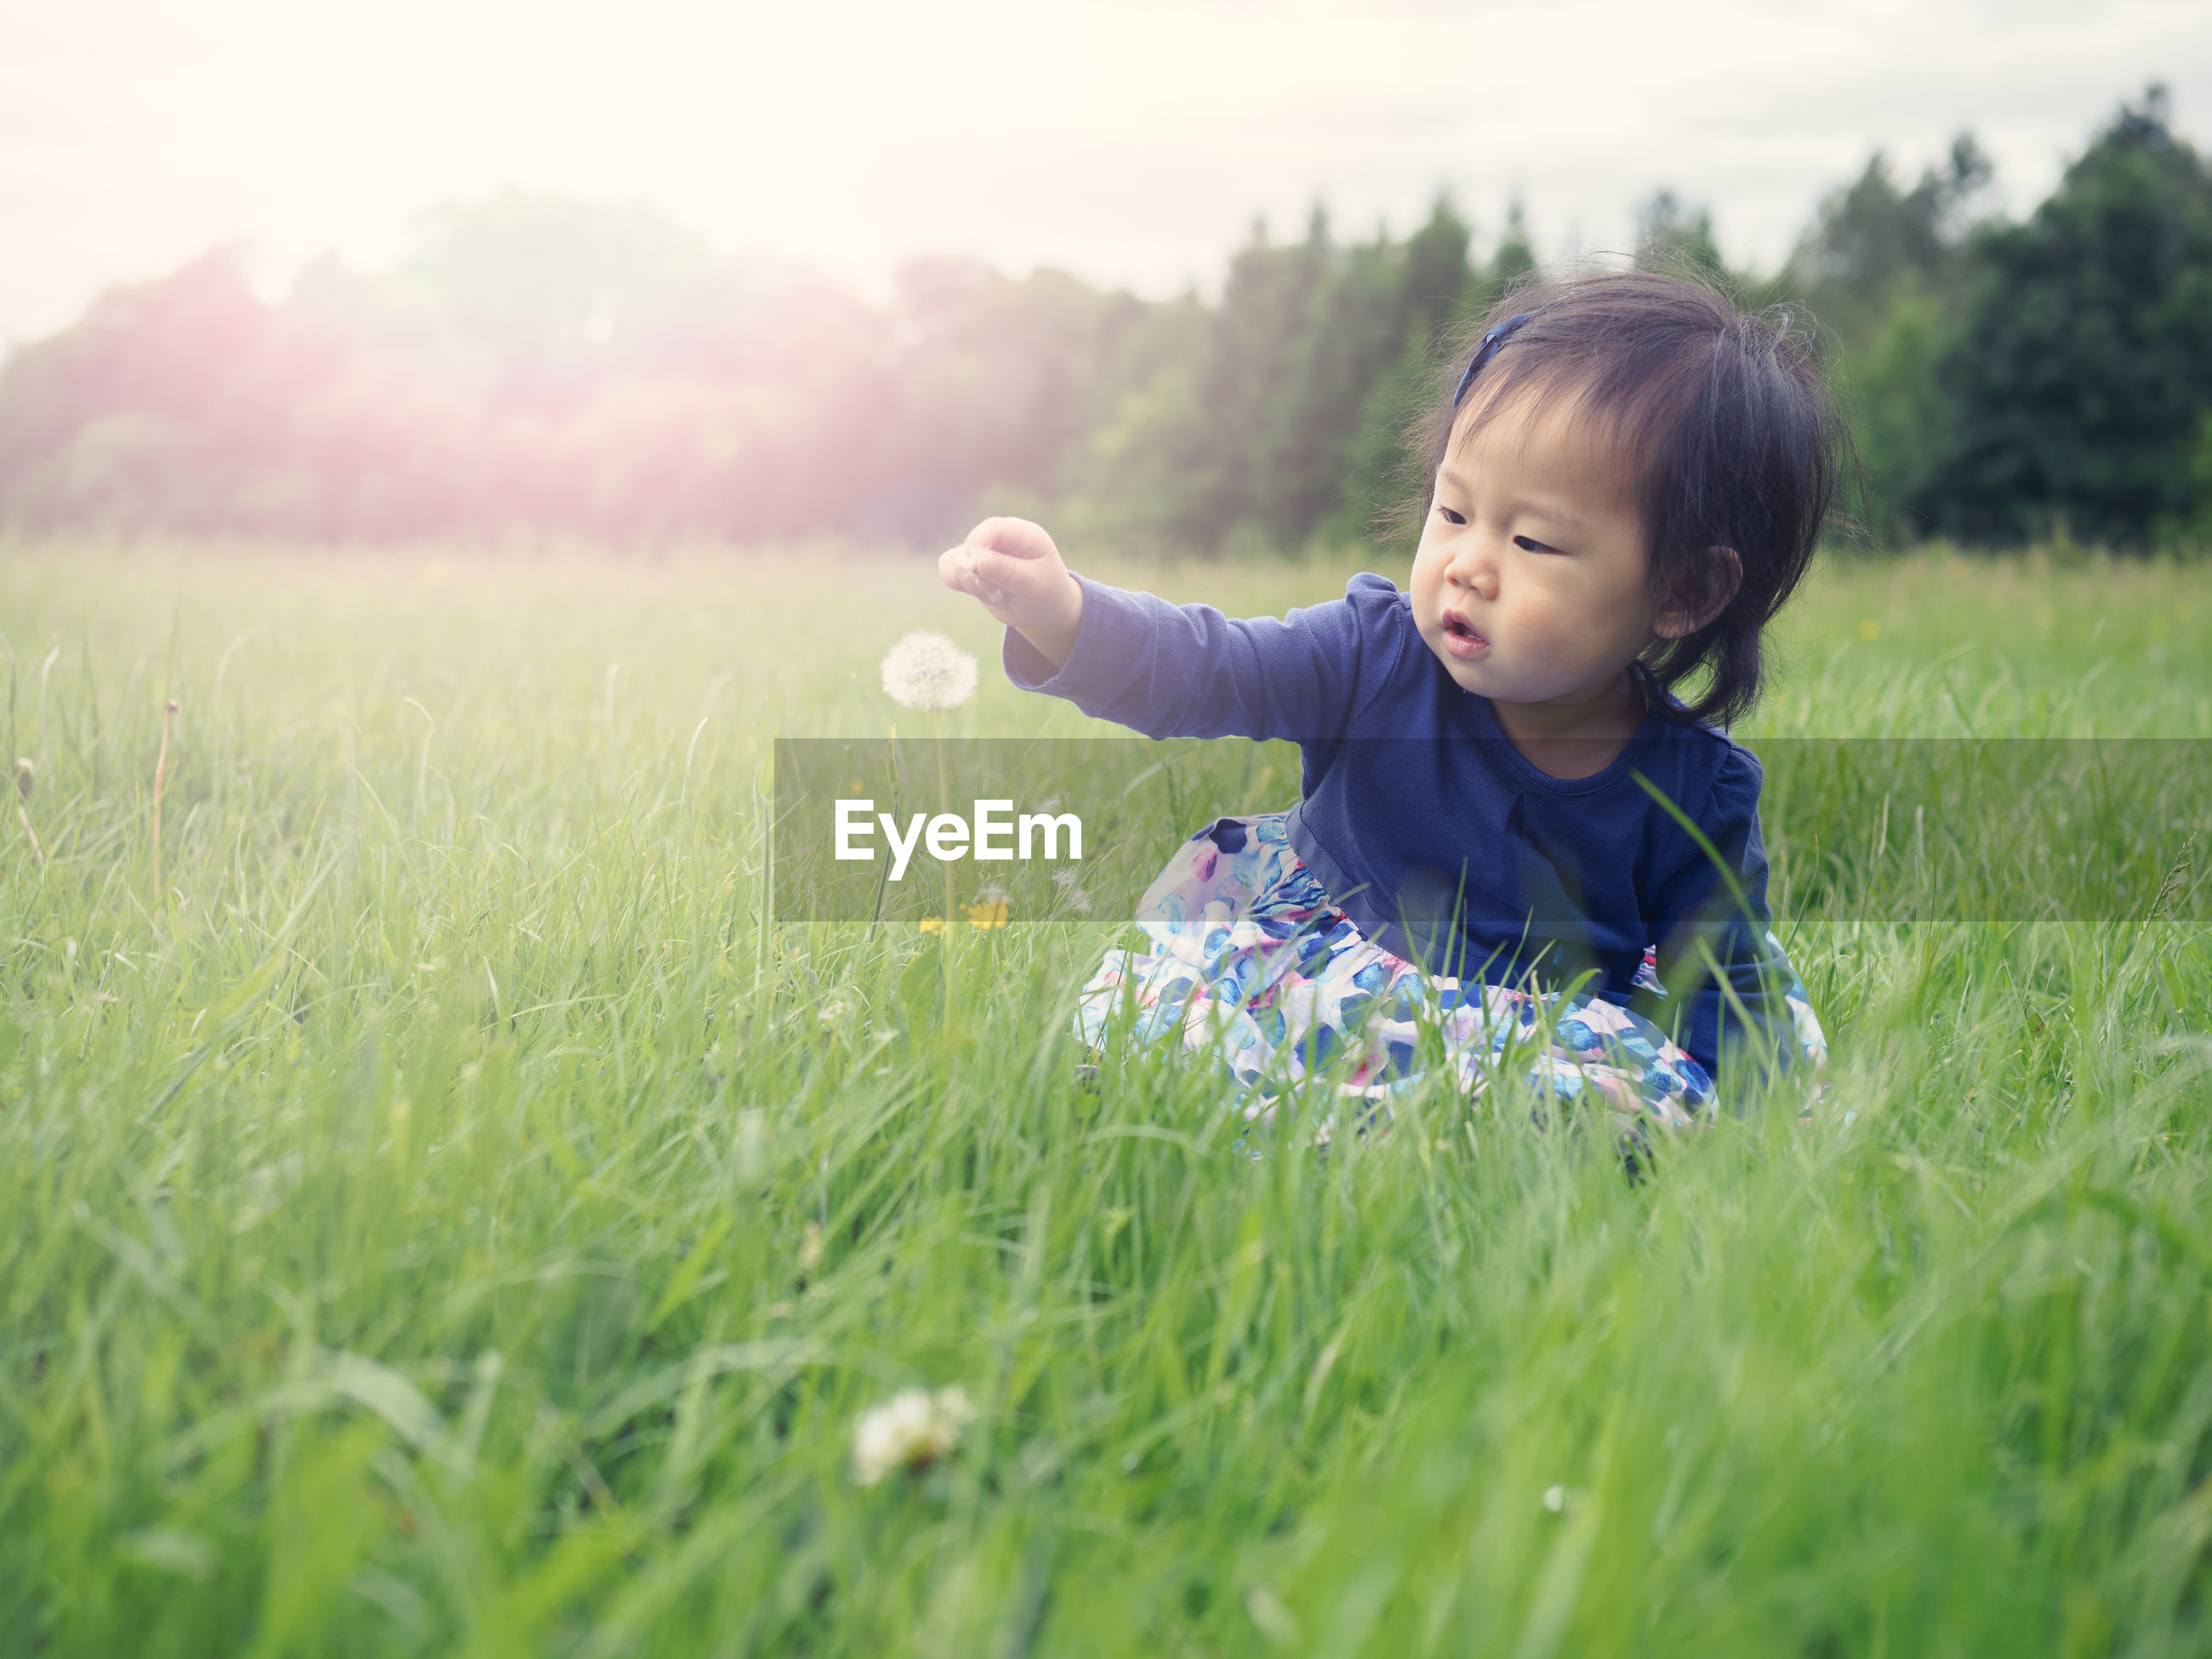 Baby girl reaching towards dandelion growing on grassy field